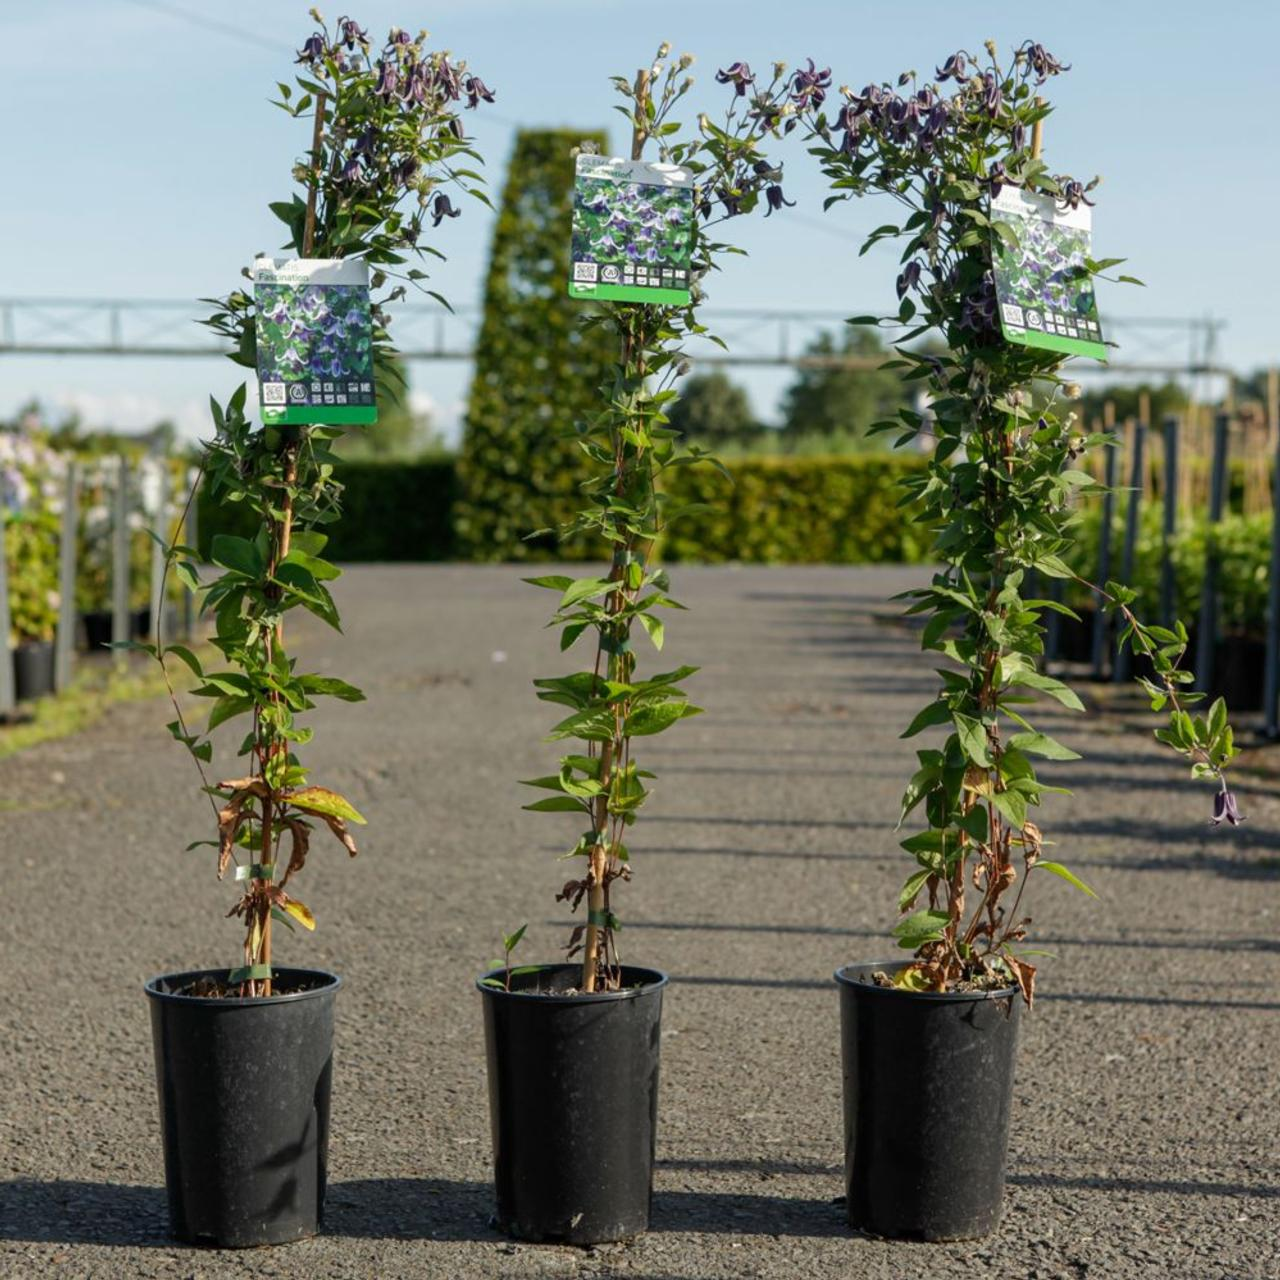 Clematis 'Fascination' plant